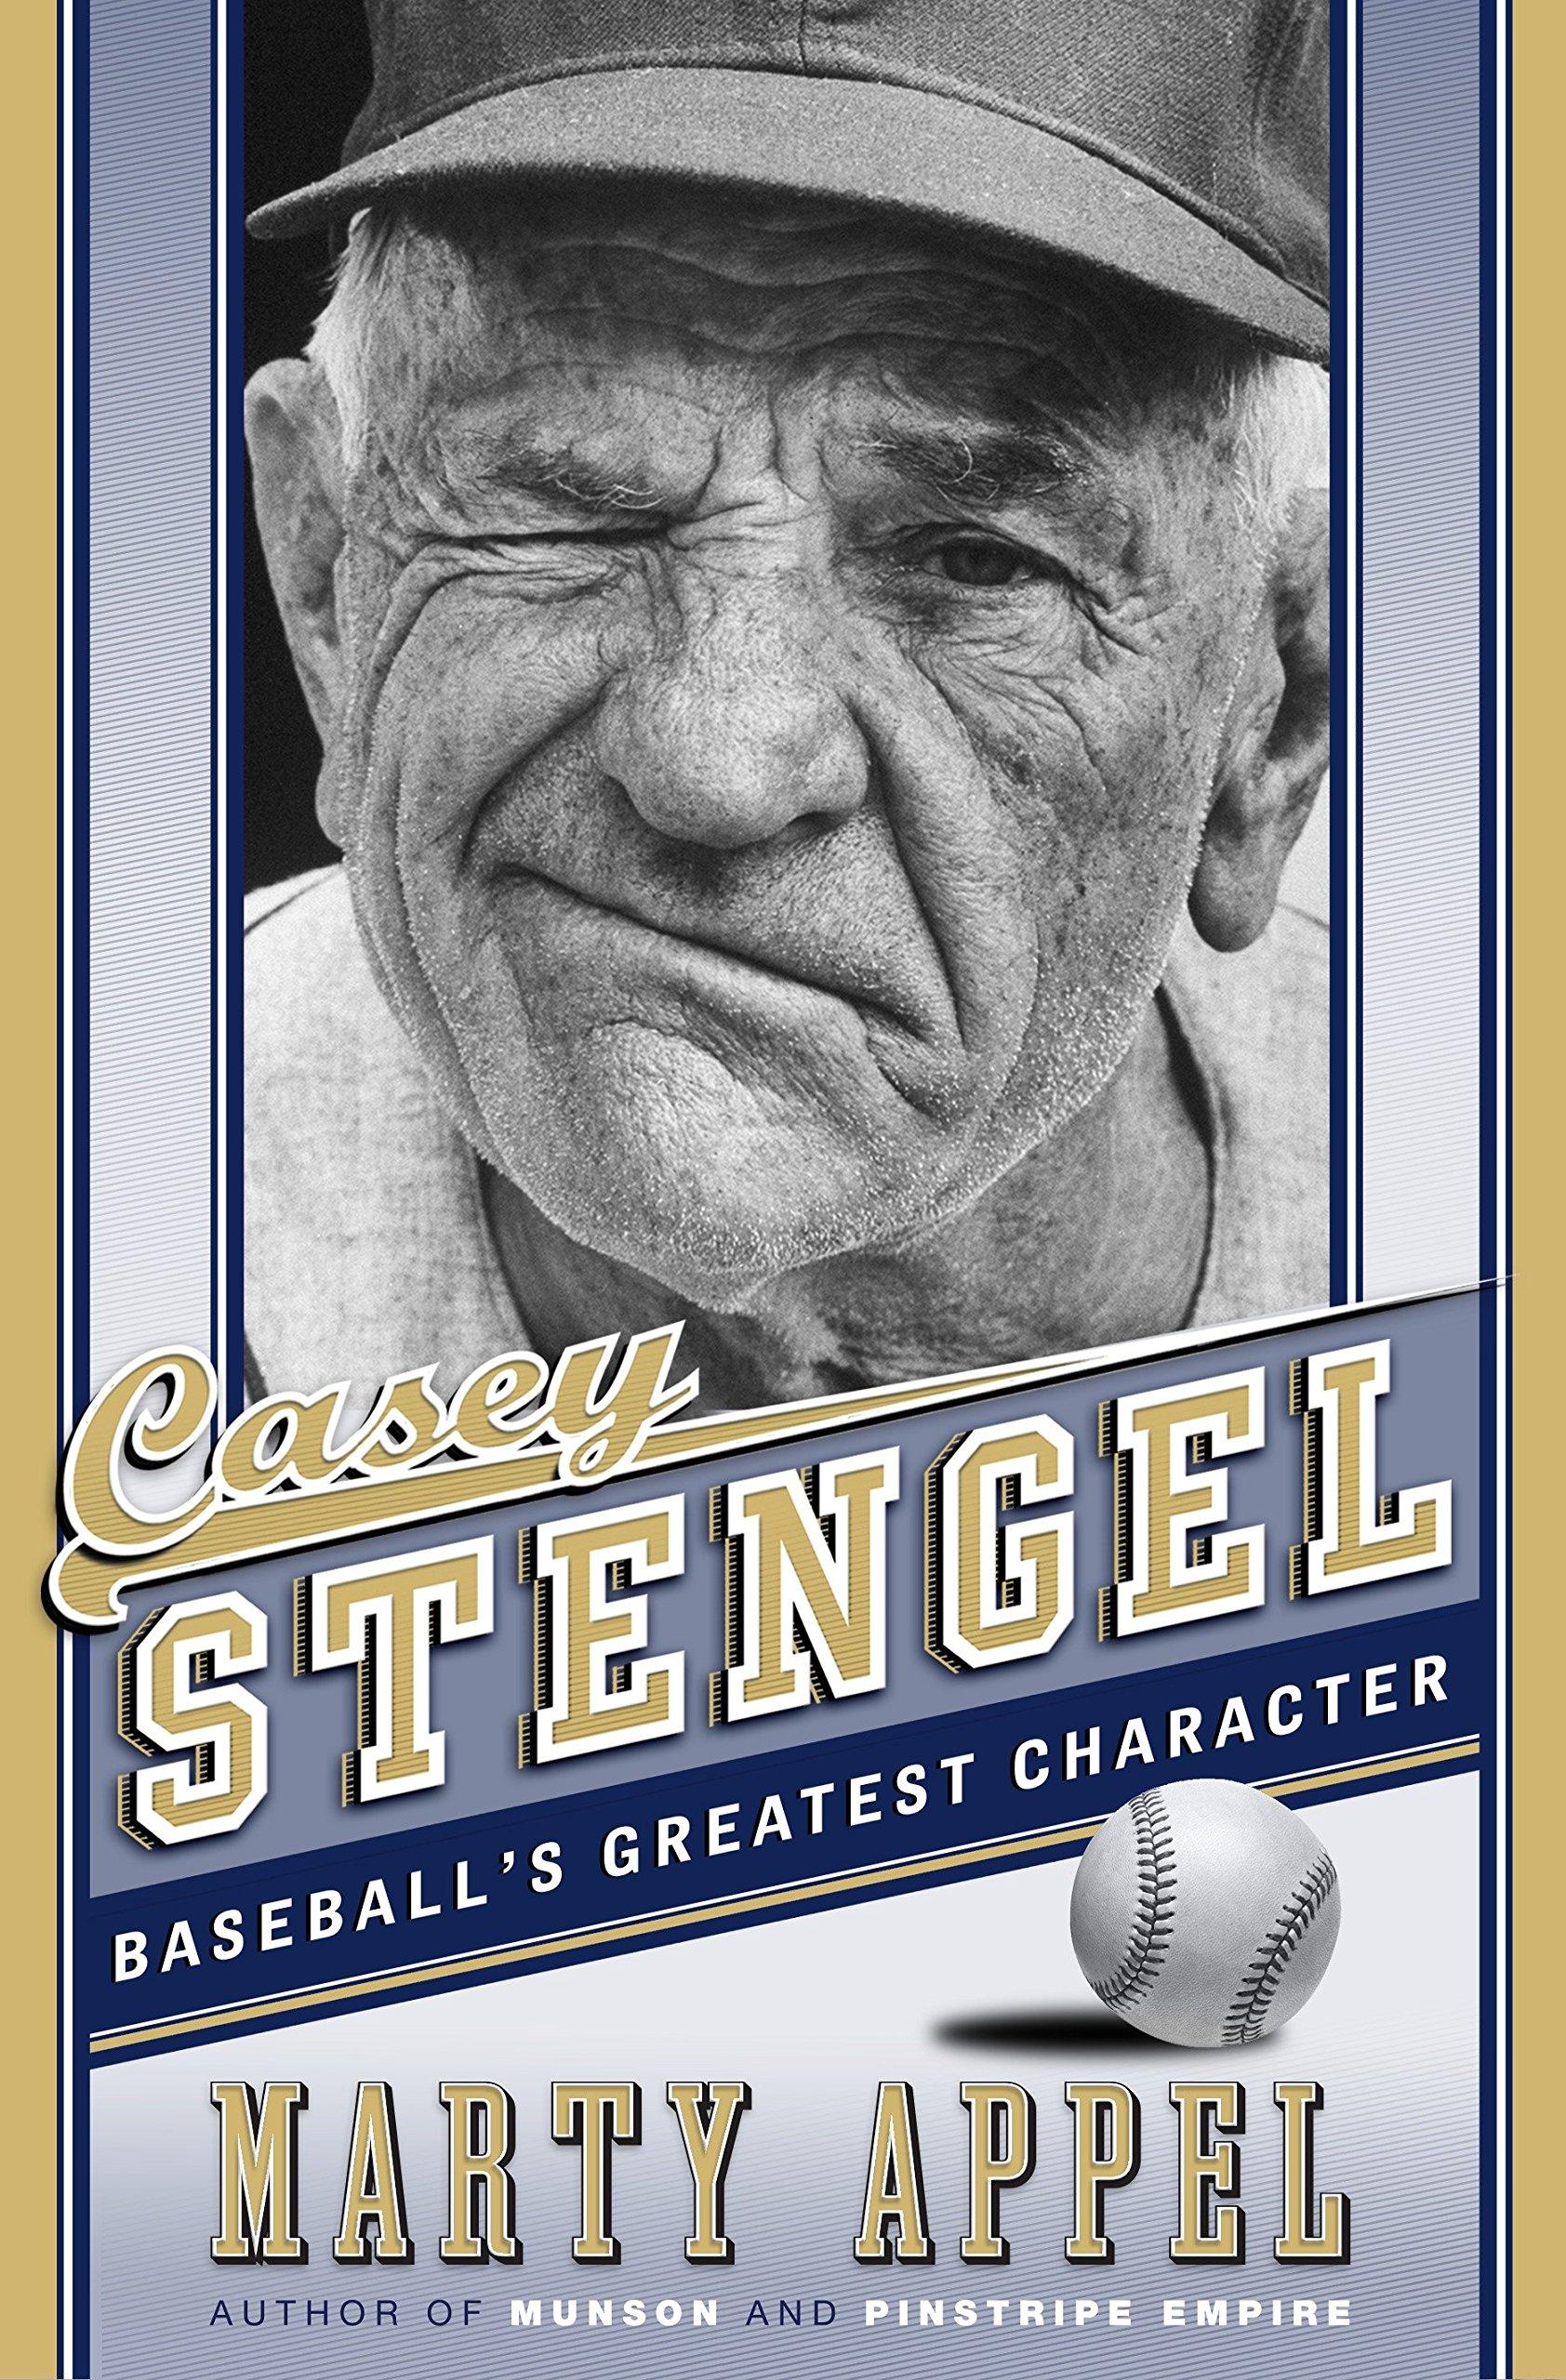 Download Casey Stengel: Baseball's Greatest Character ebook